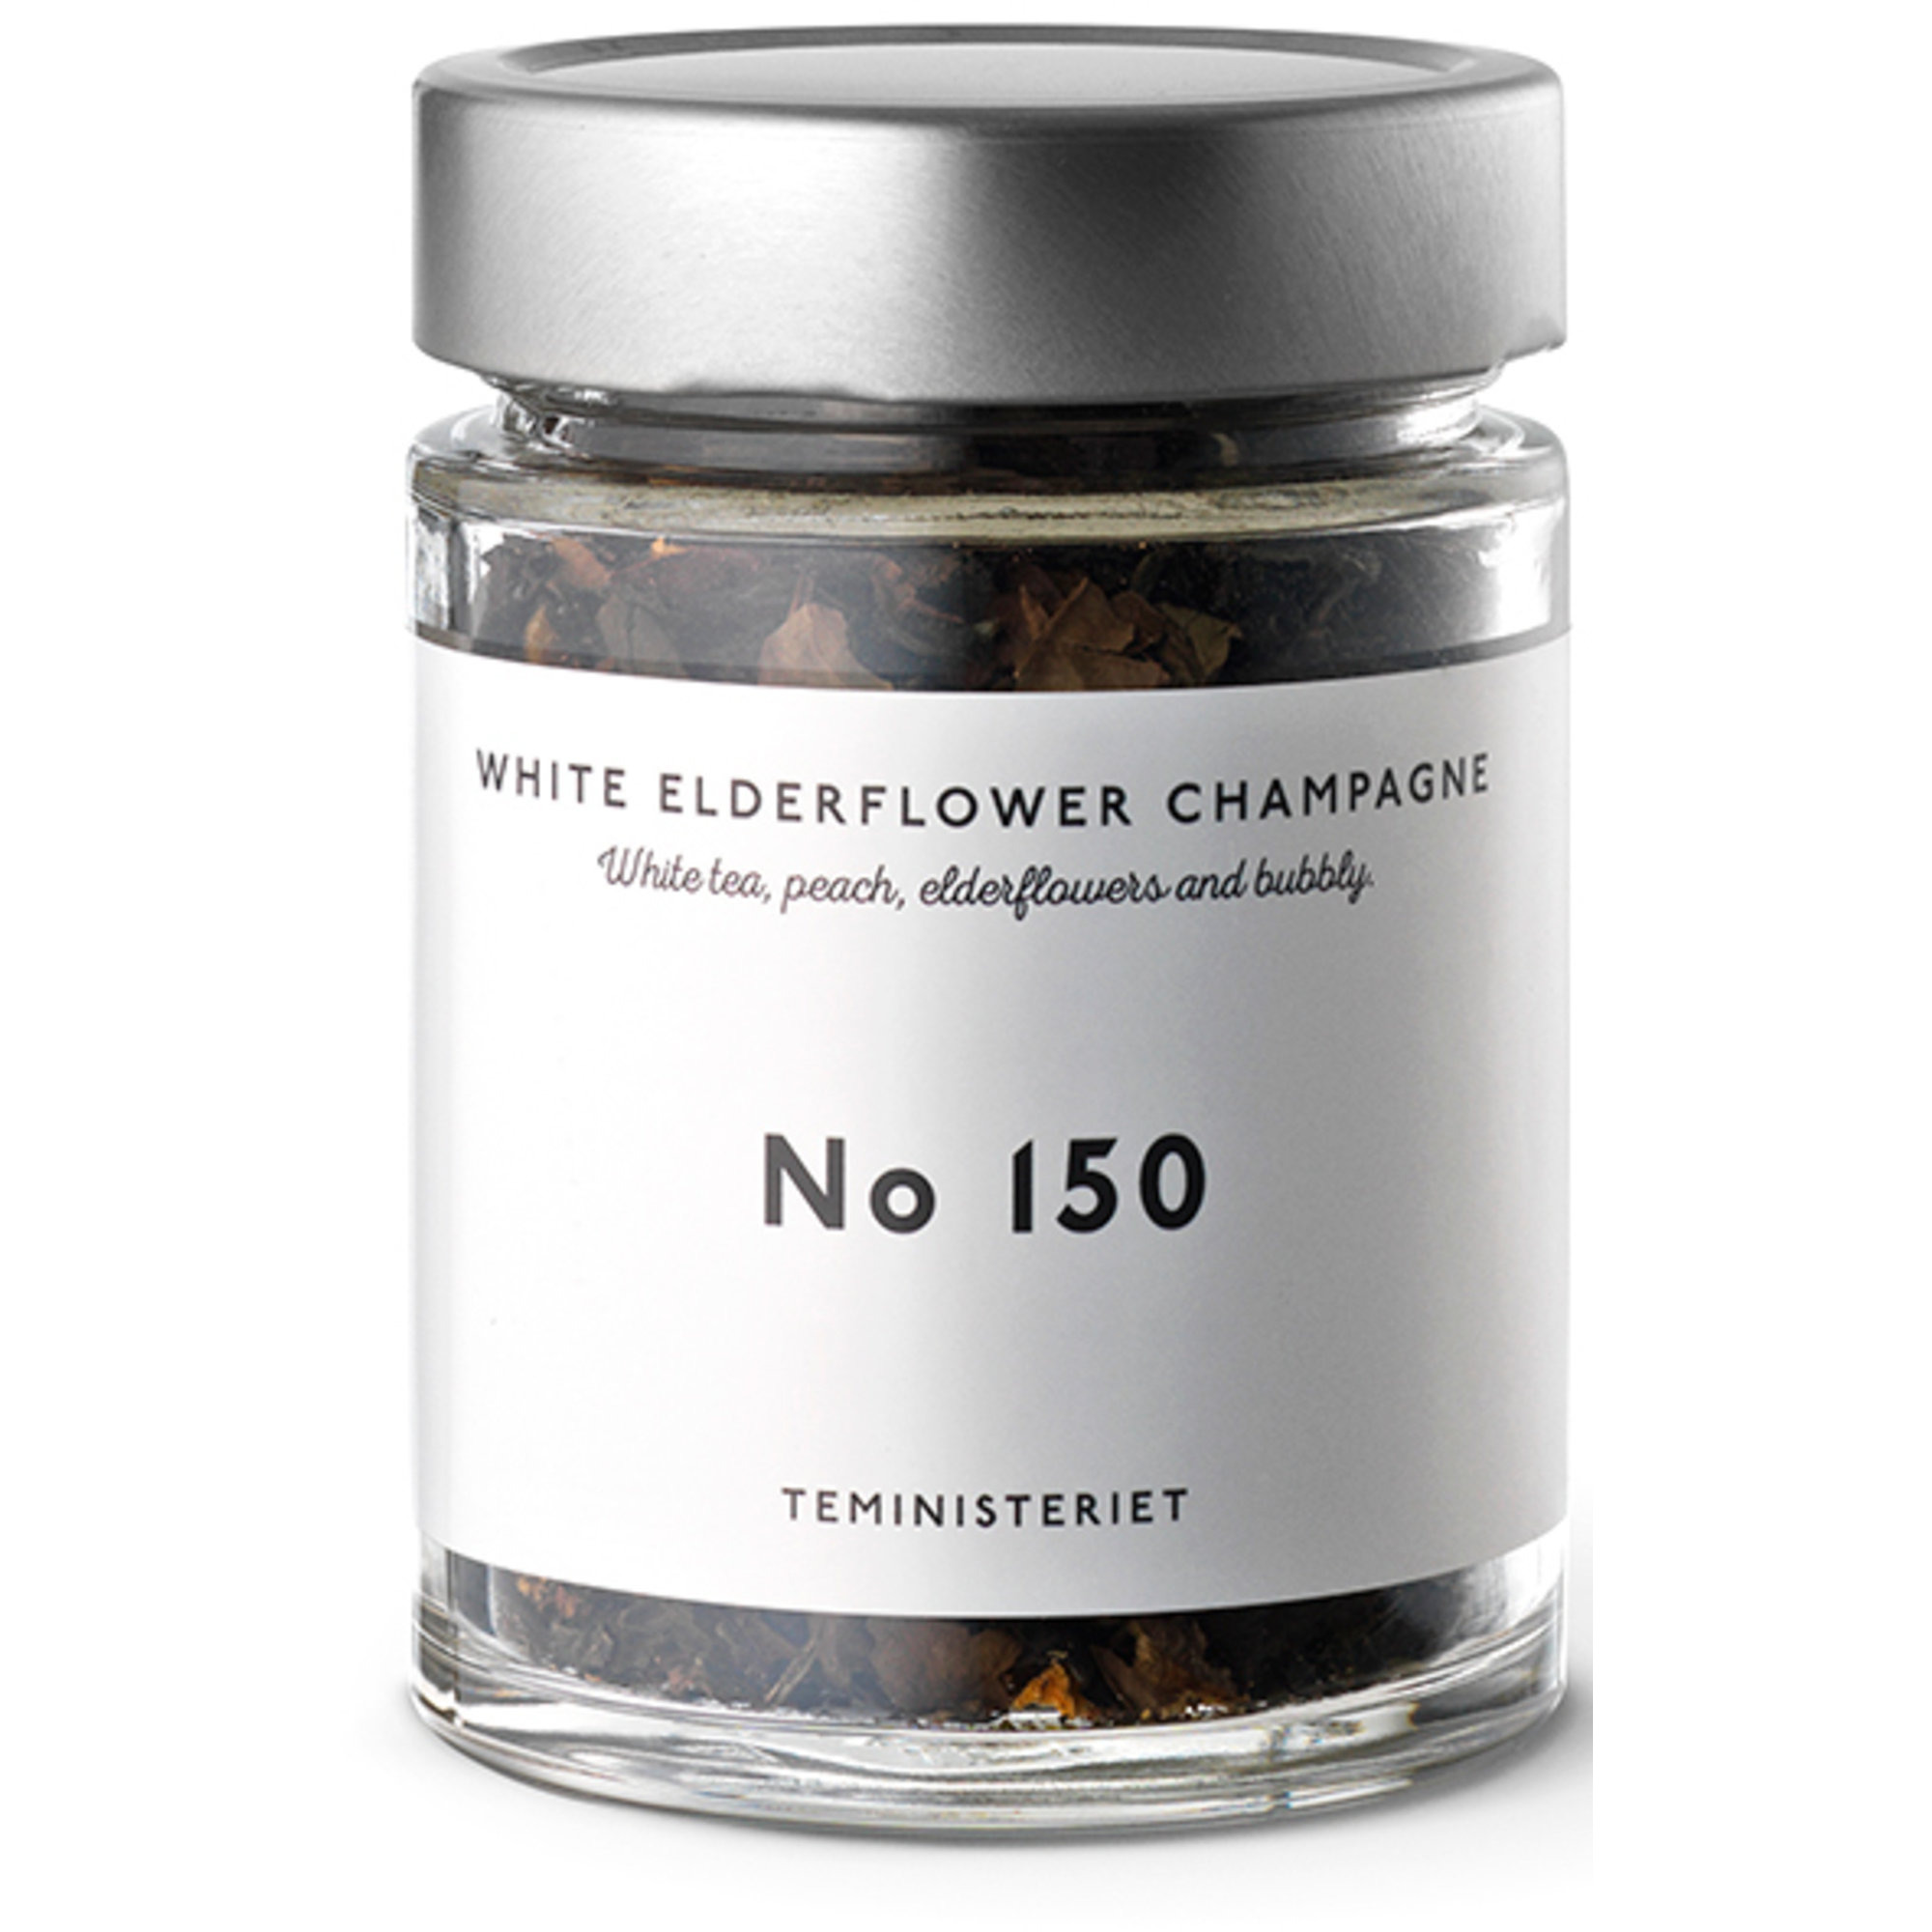 Teministeriet No. 150 White Elderflower Champagne te